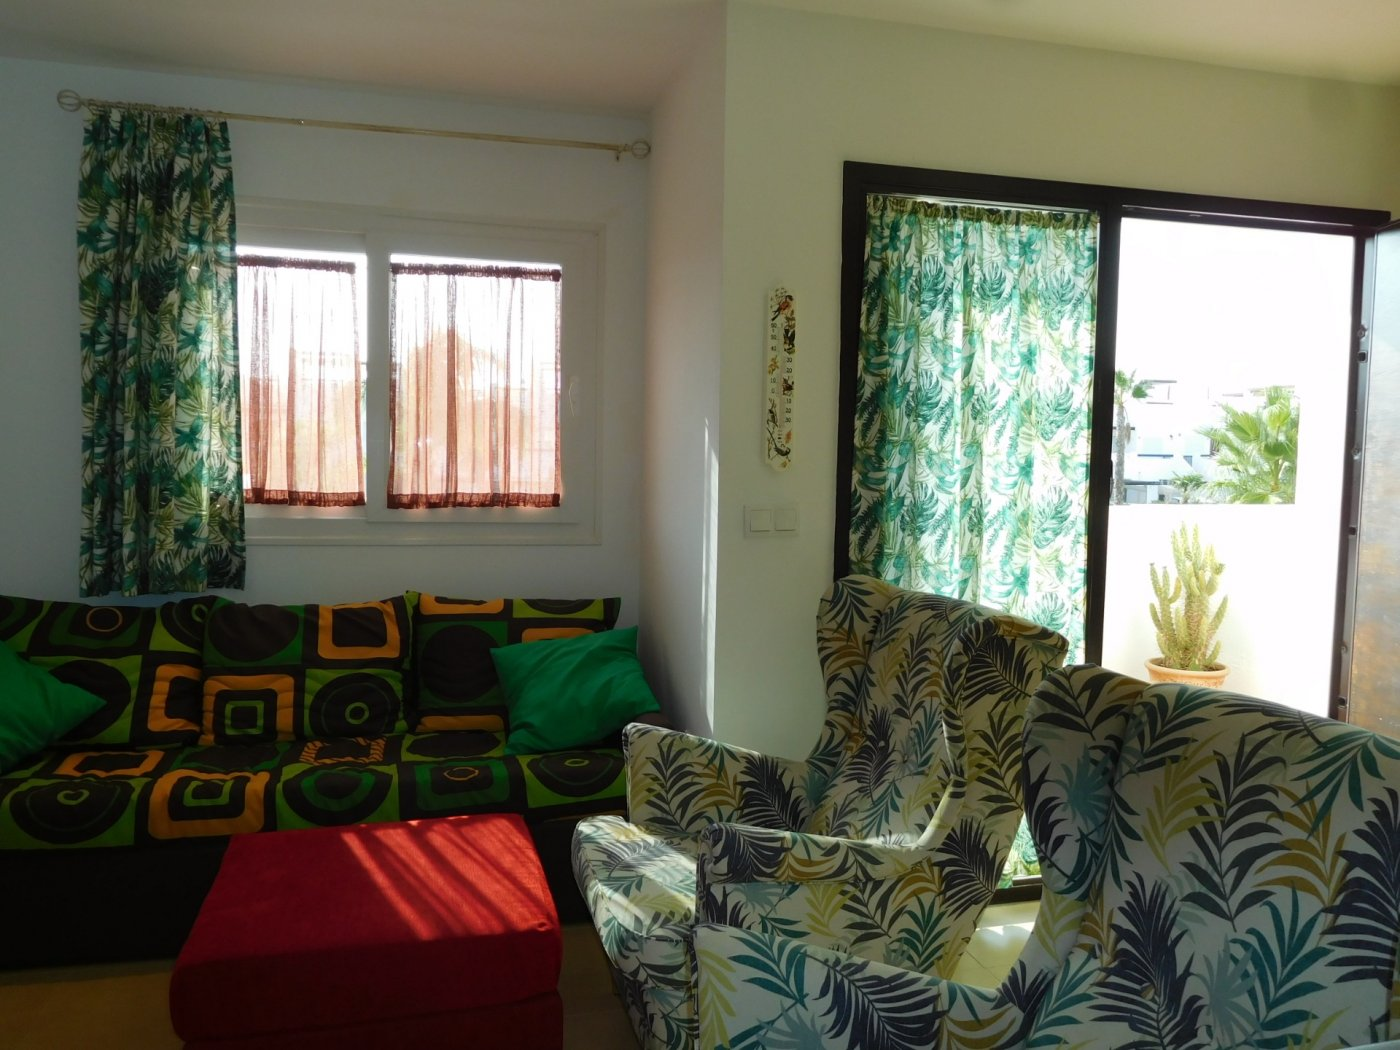 Image 5 Amarre ref 3265-03033 for rent in Condado De Alhama Spain - Quality Homes Costa Cálida